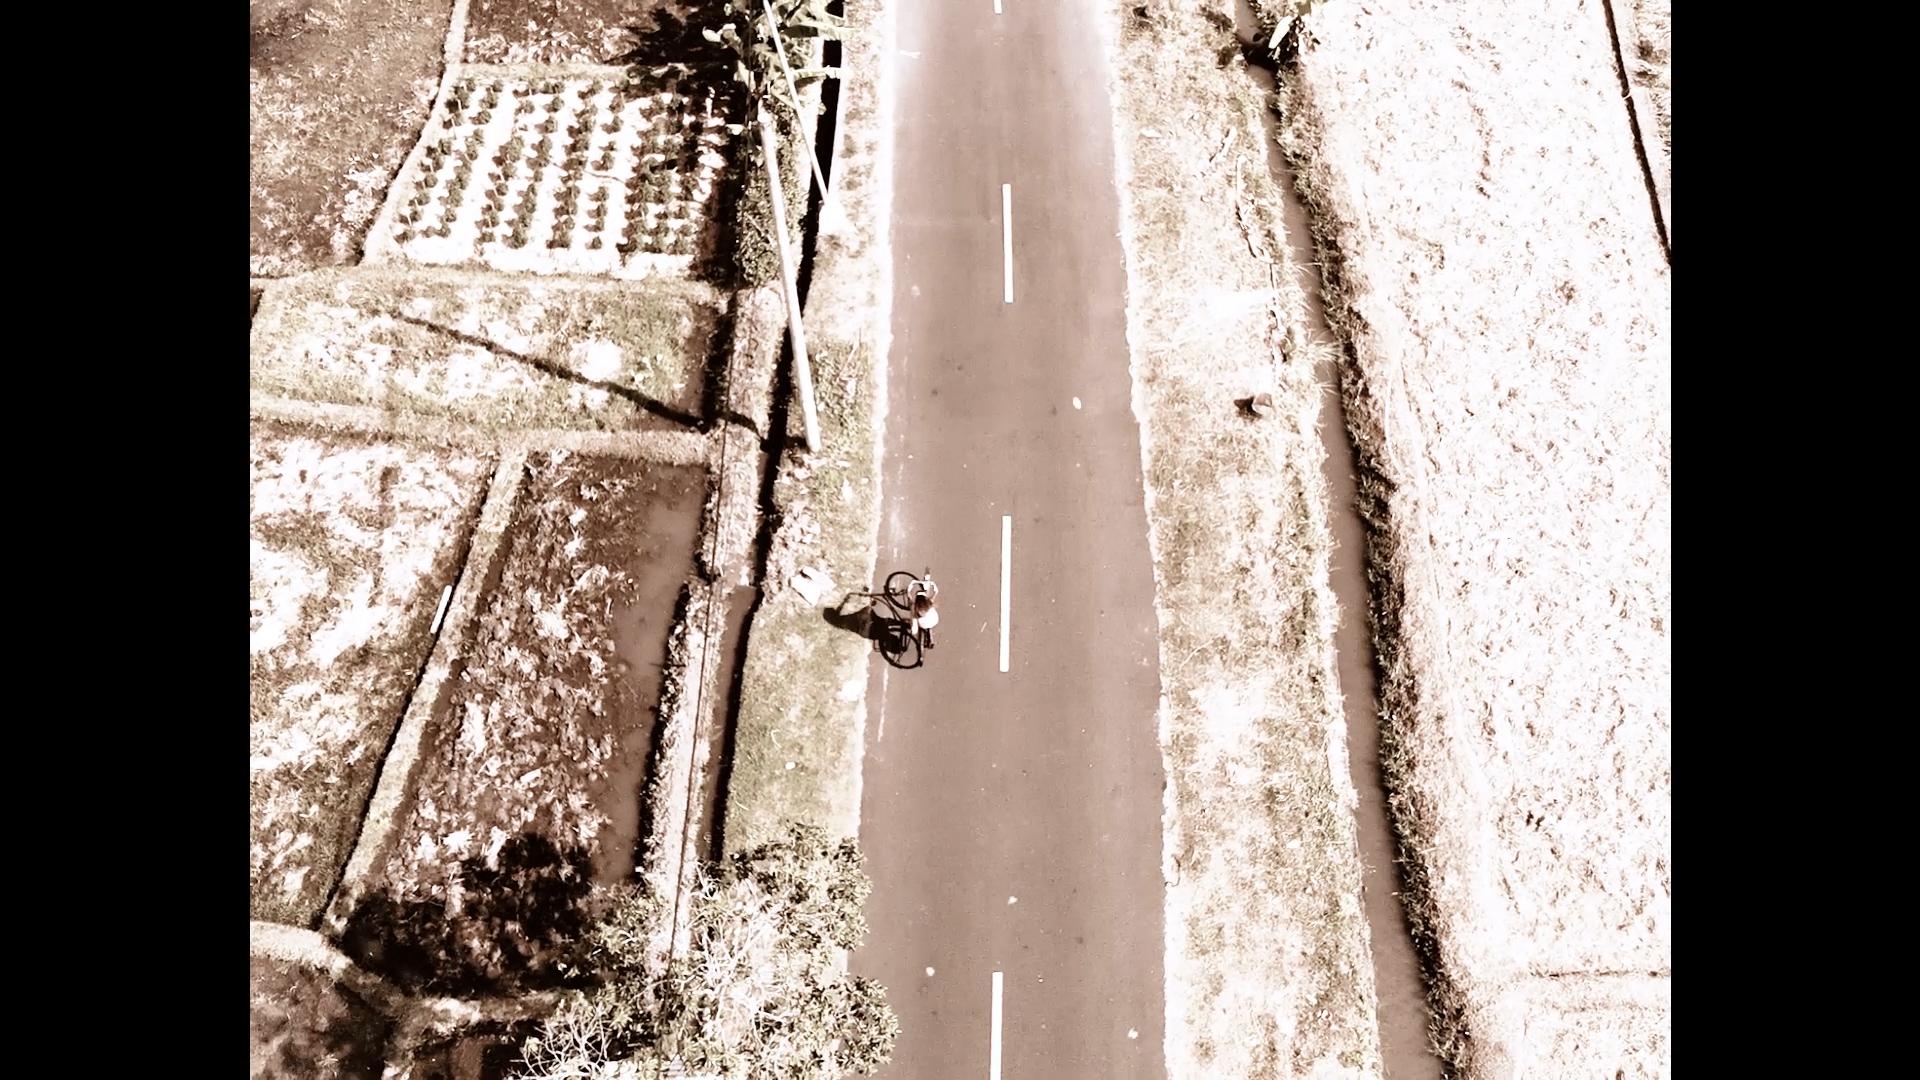 024-cyclingcommando-Putri-Cinta-teaser-stills-1.jpg